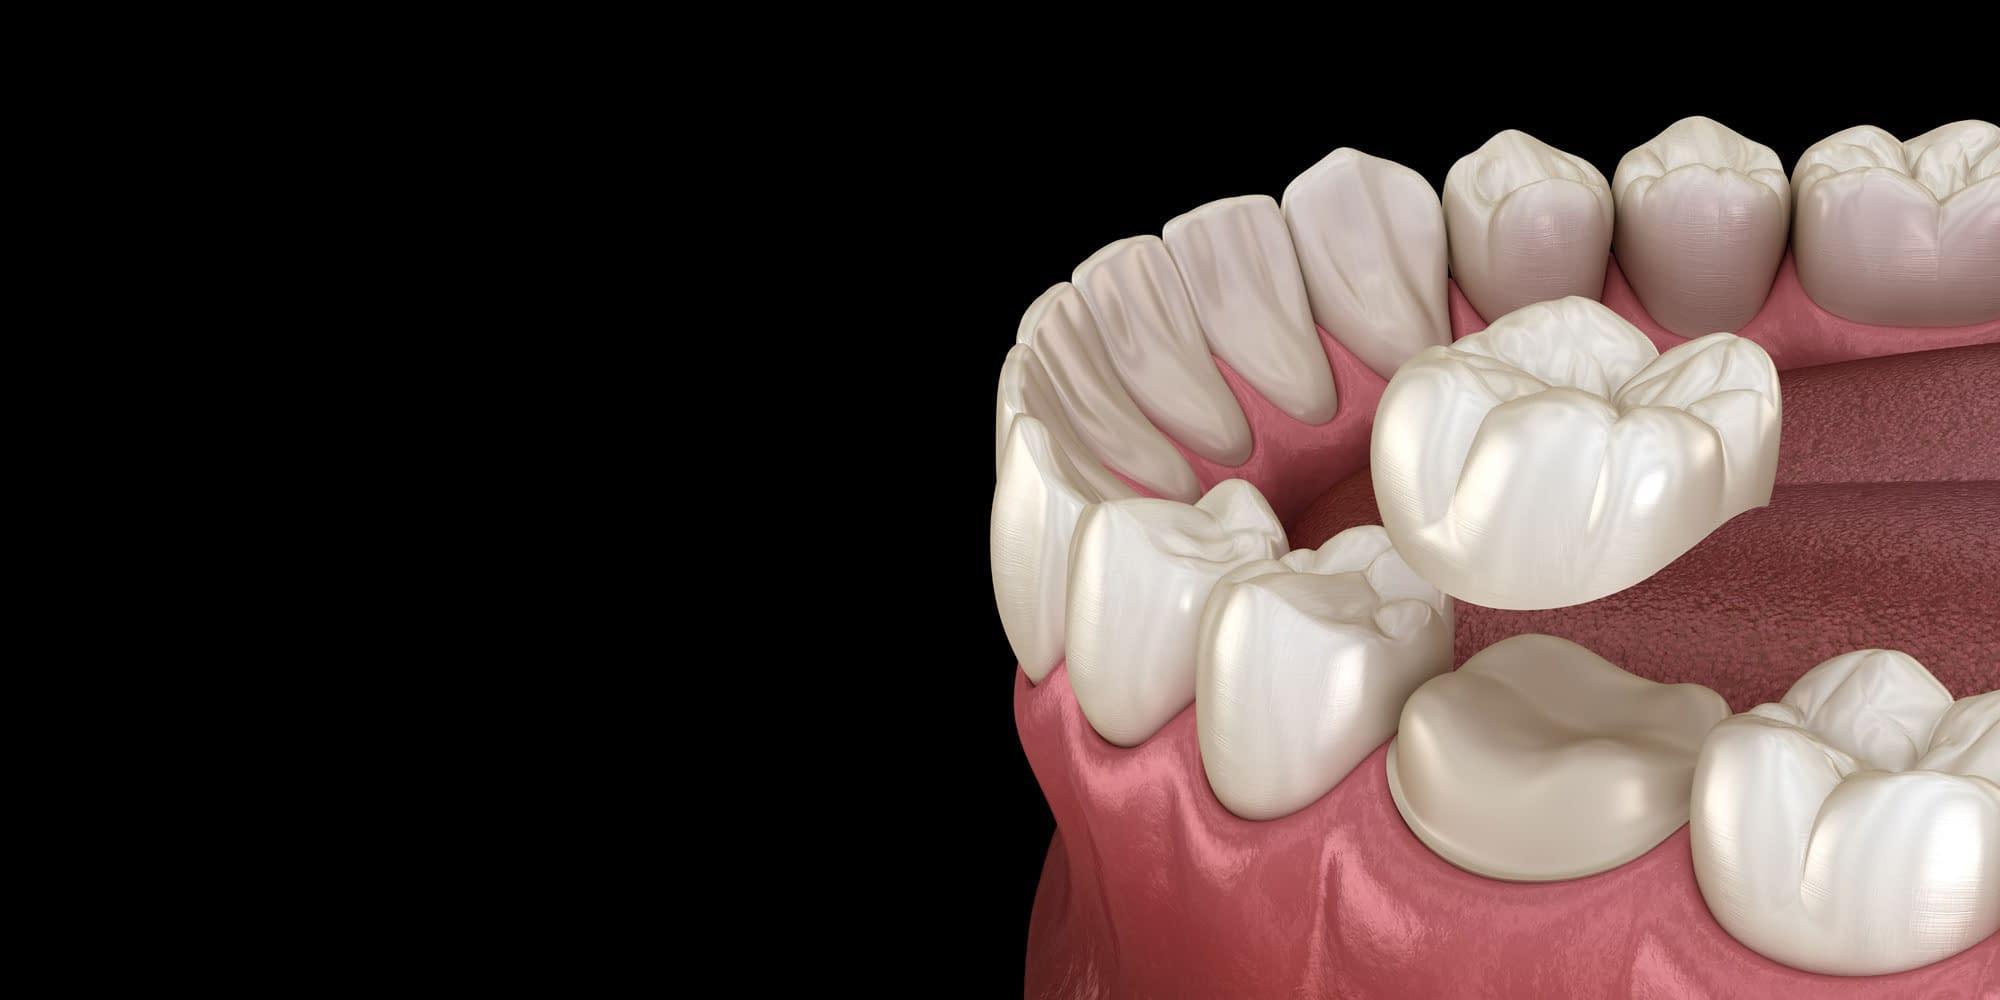 dental crowns model